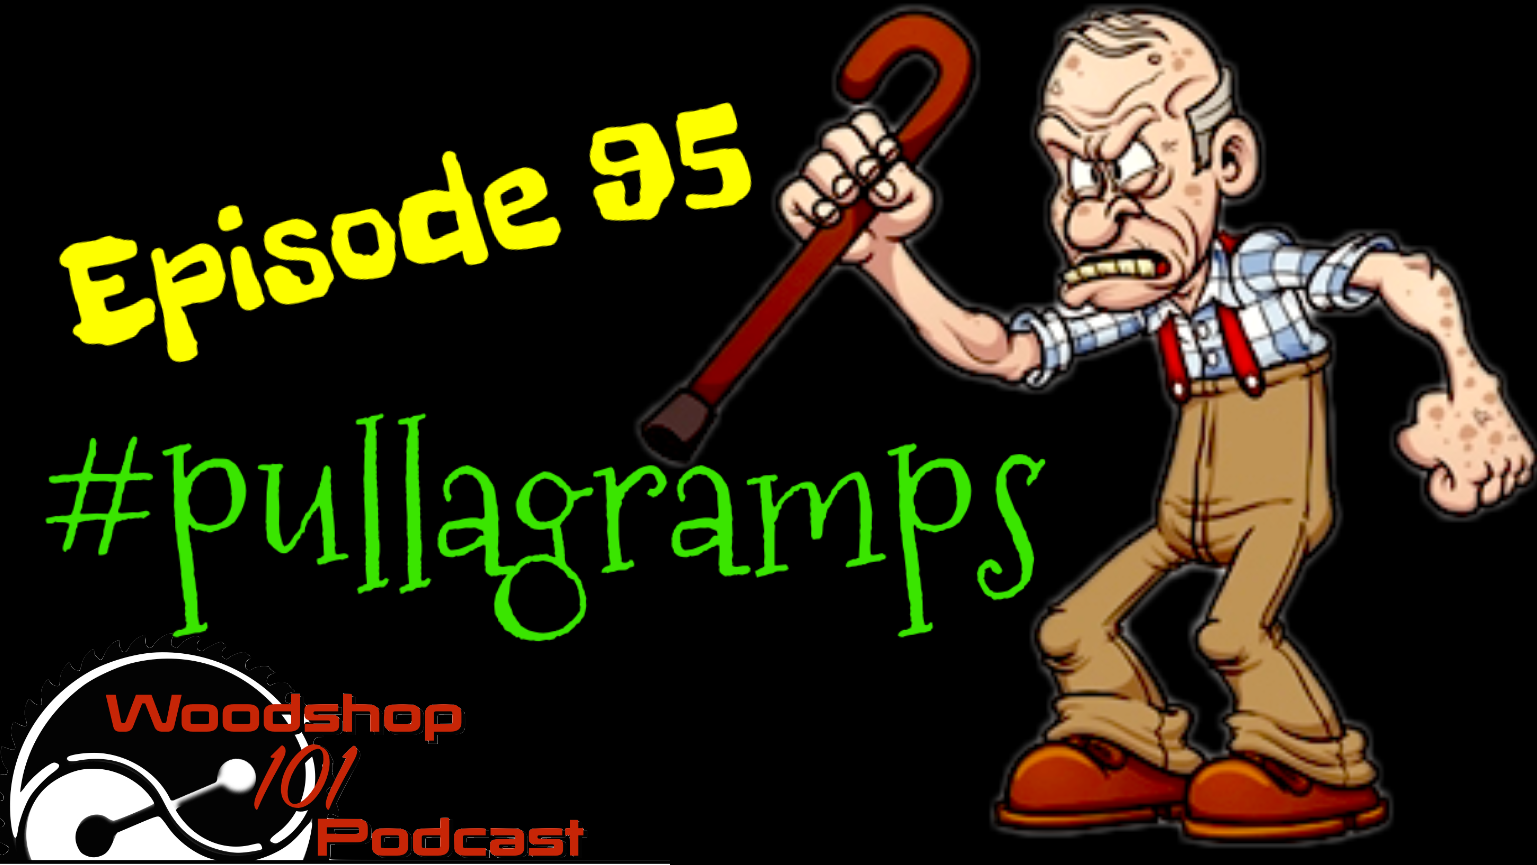 Episode 95 Thumbnail.PNG